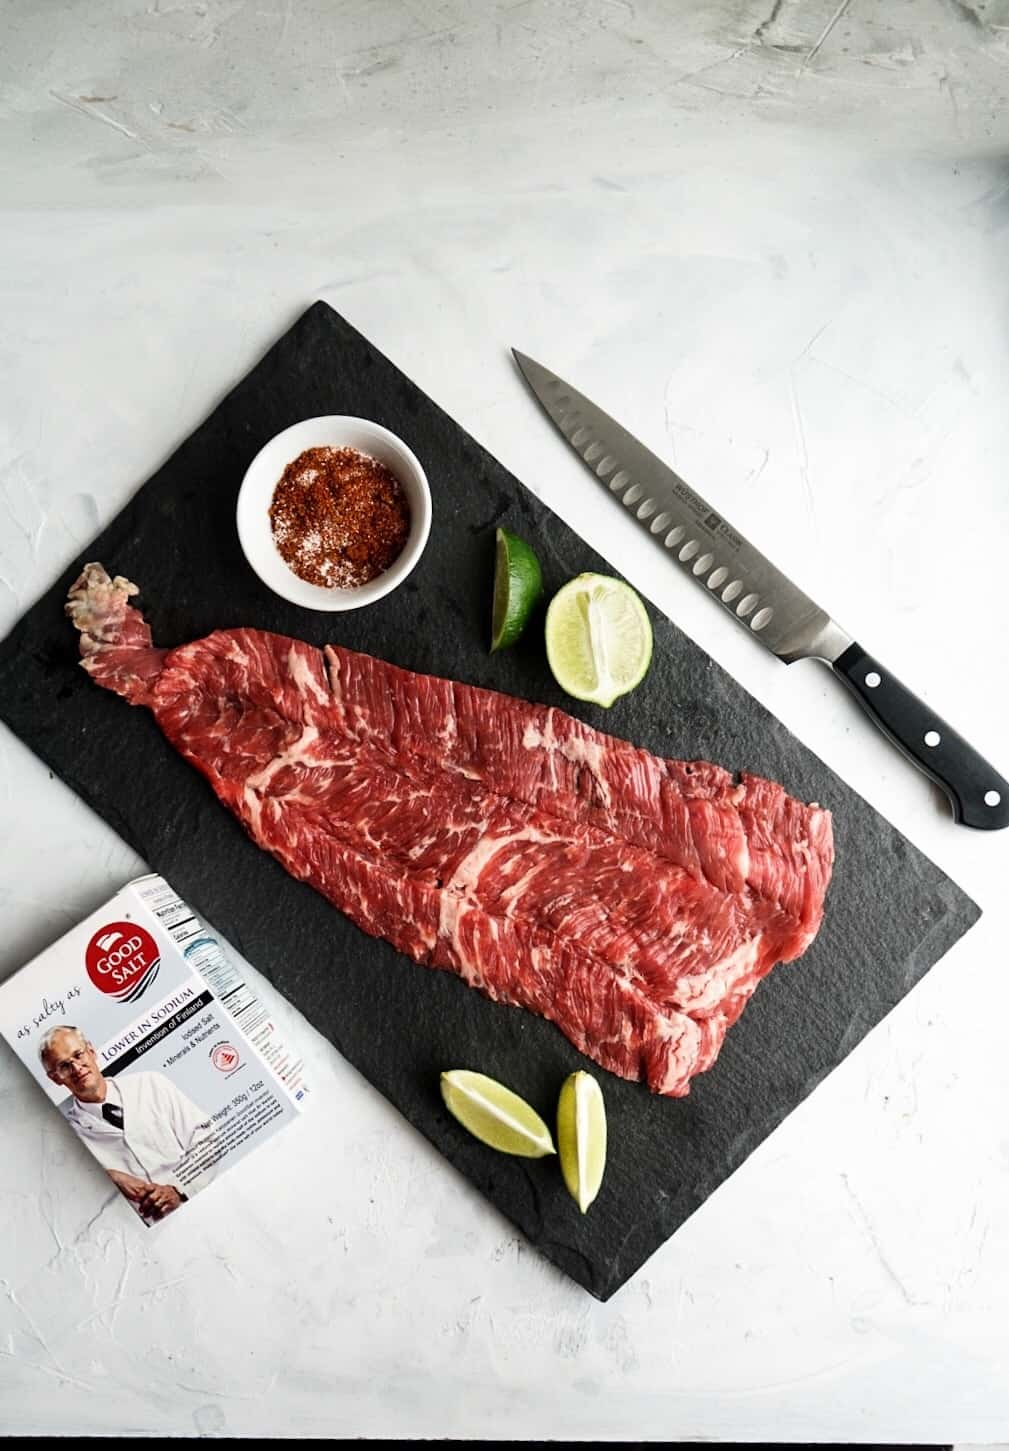 skirt steak with seasoning